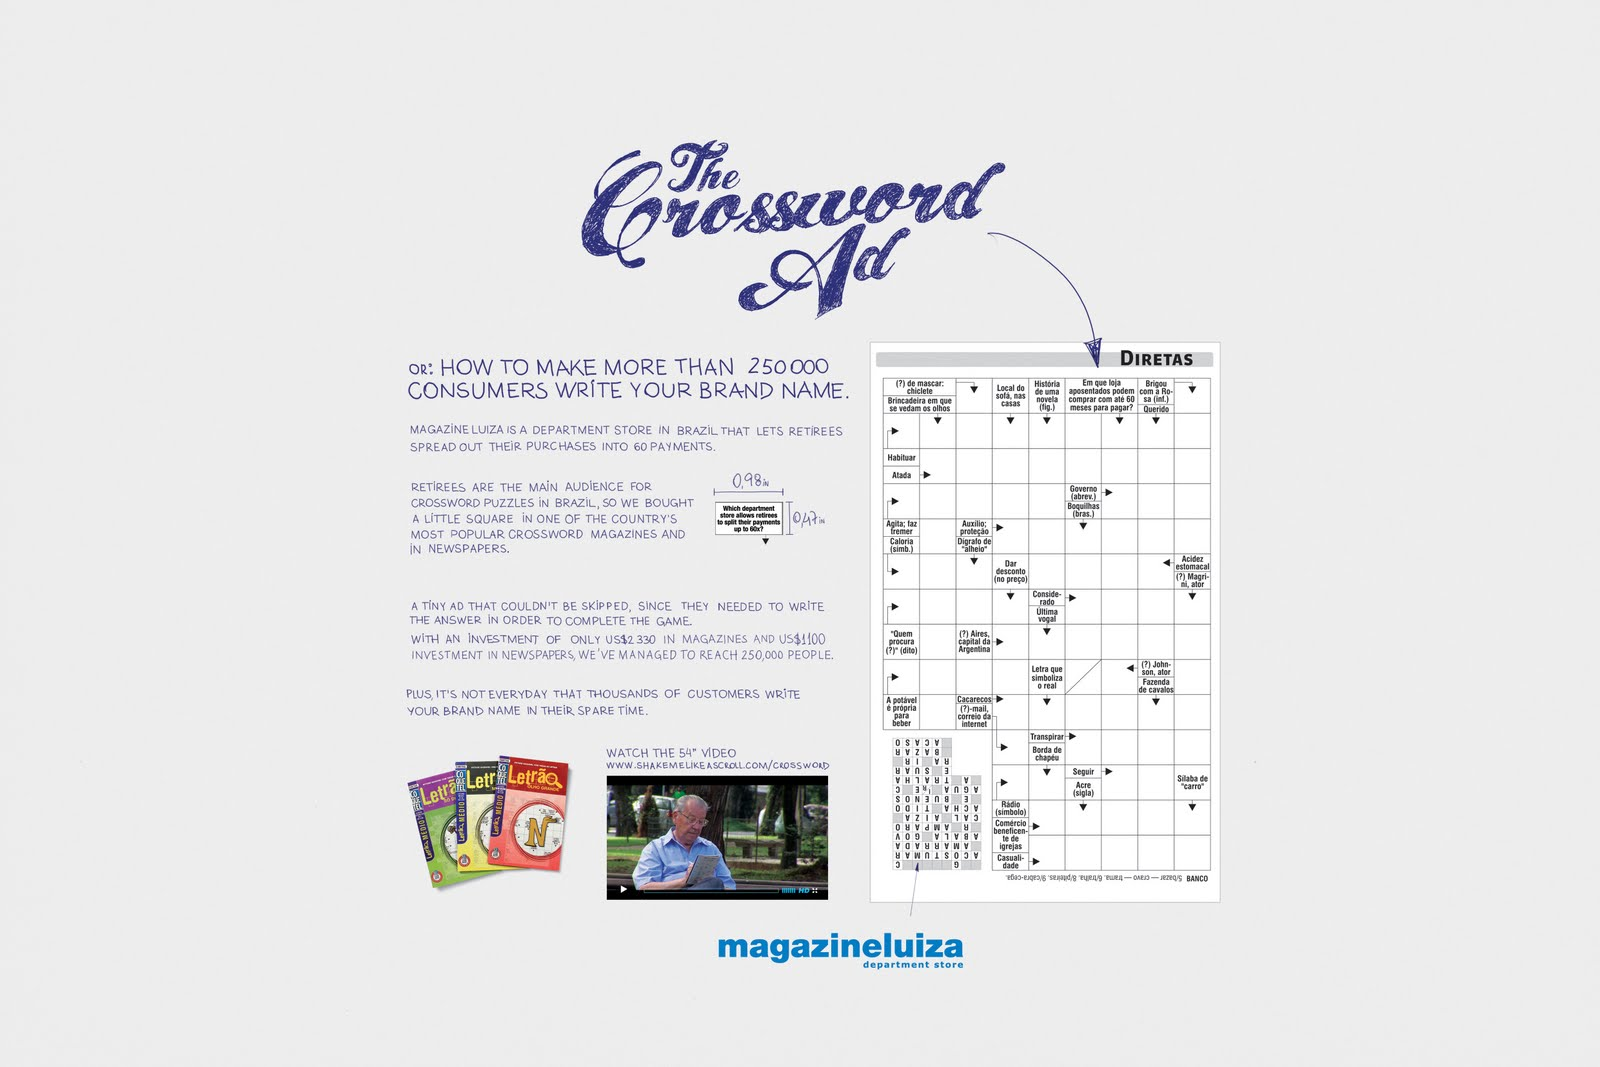 MagazineLuiza_CrosswordAd_o.jpg